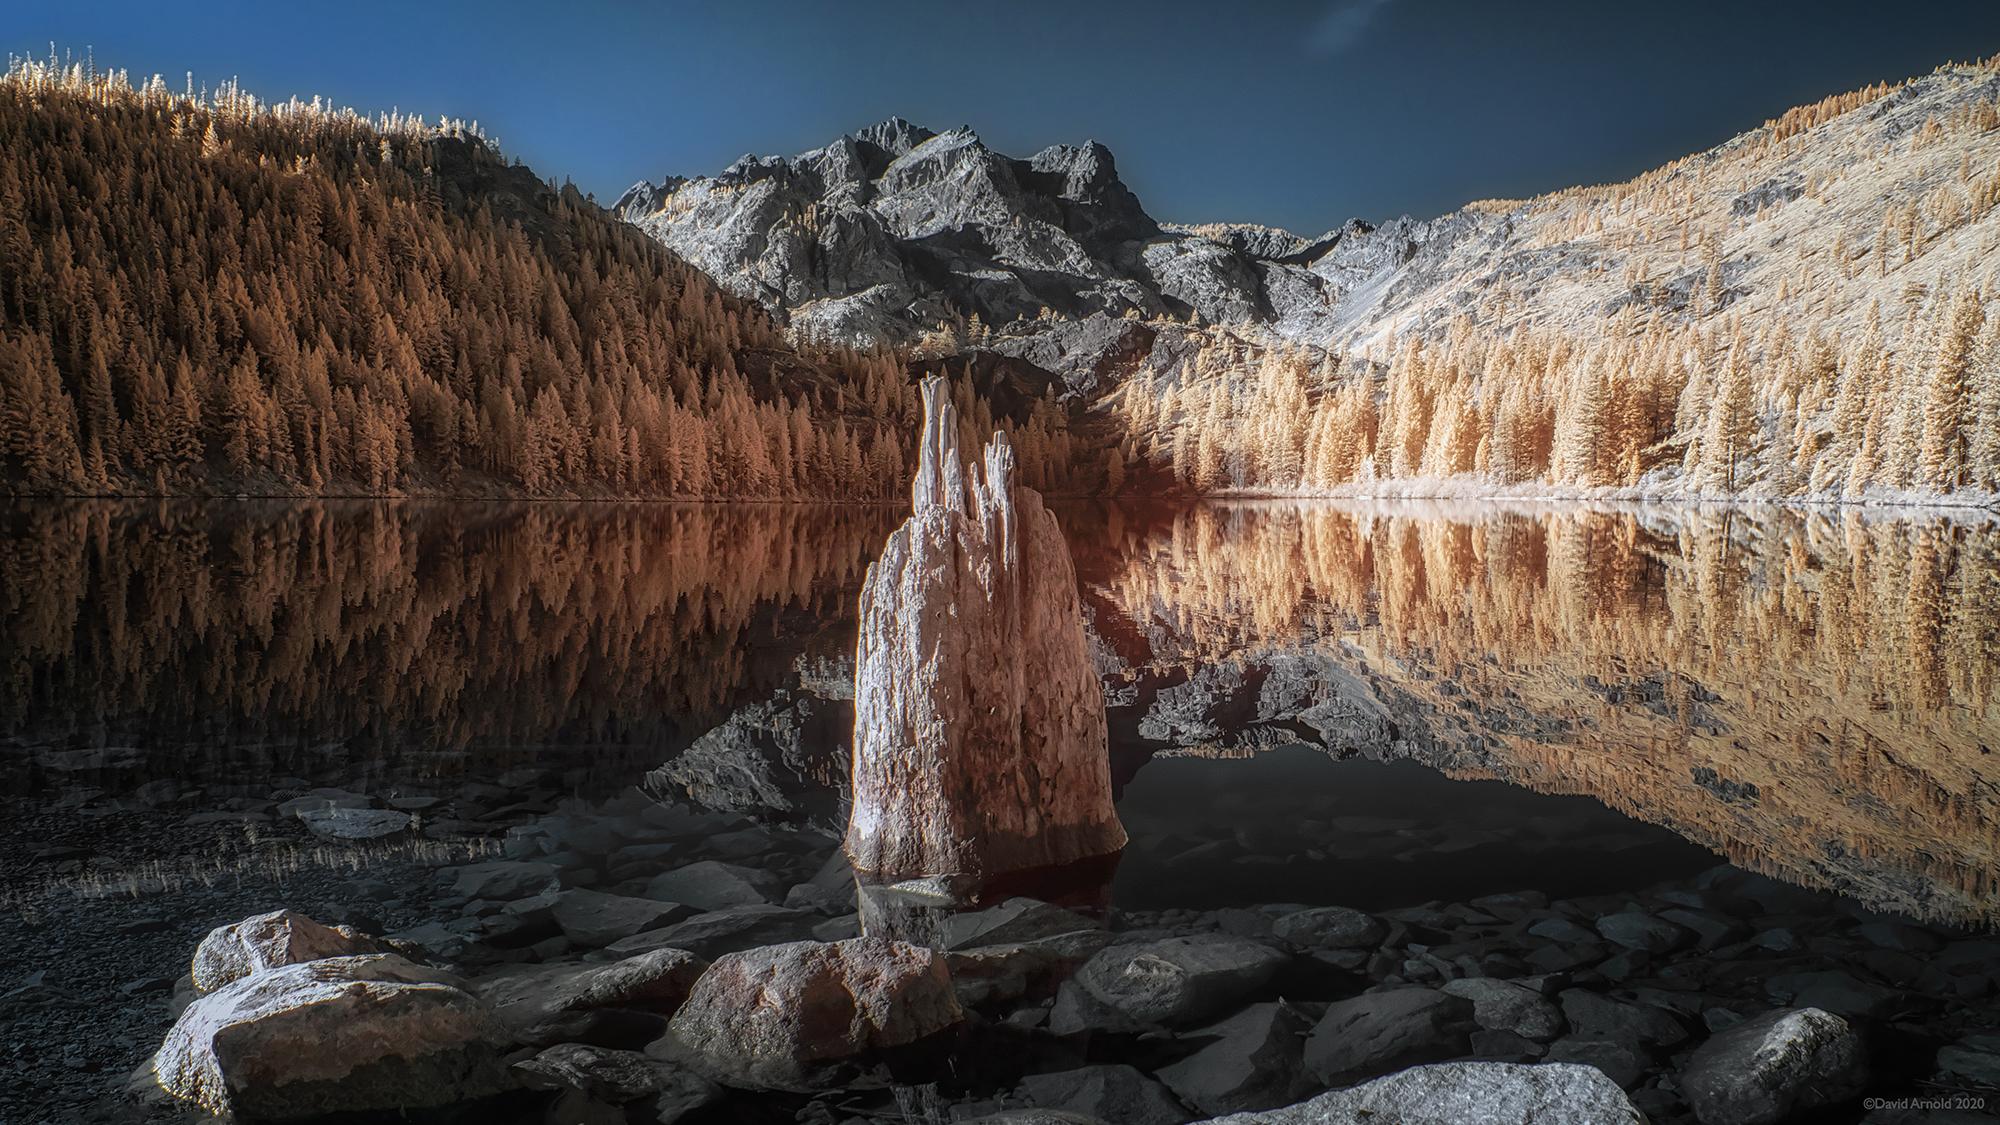 Stump. Sardine Lake, Plumas National Forest, California